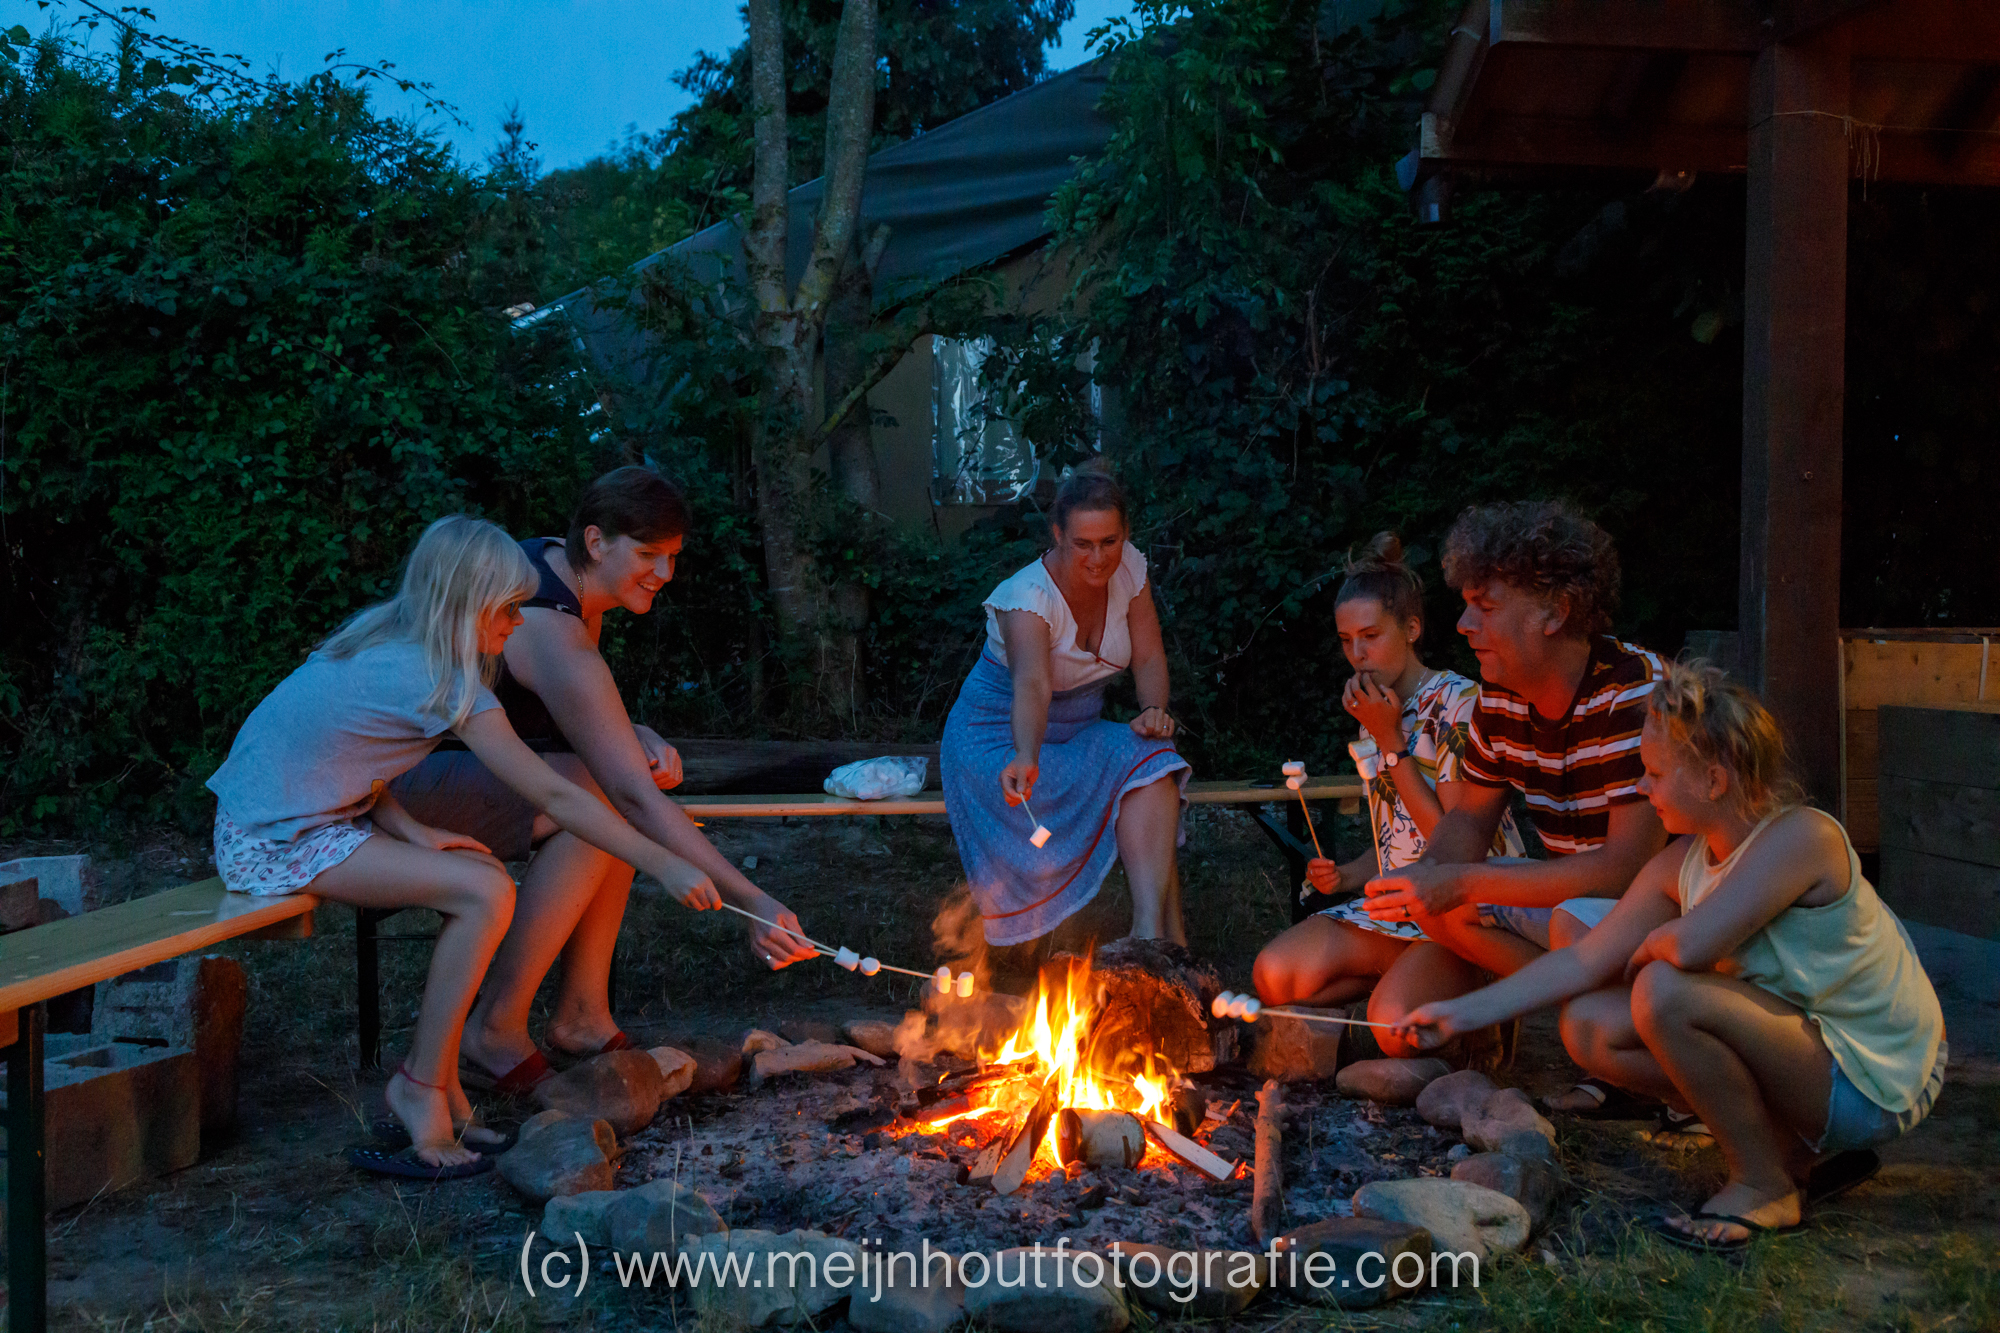 20180730-_MG_9804 Camping Sy Ardennen Belgium.jpg